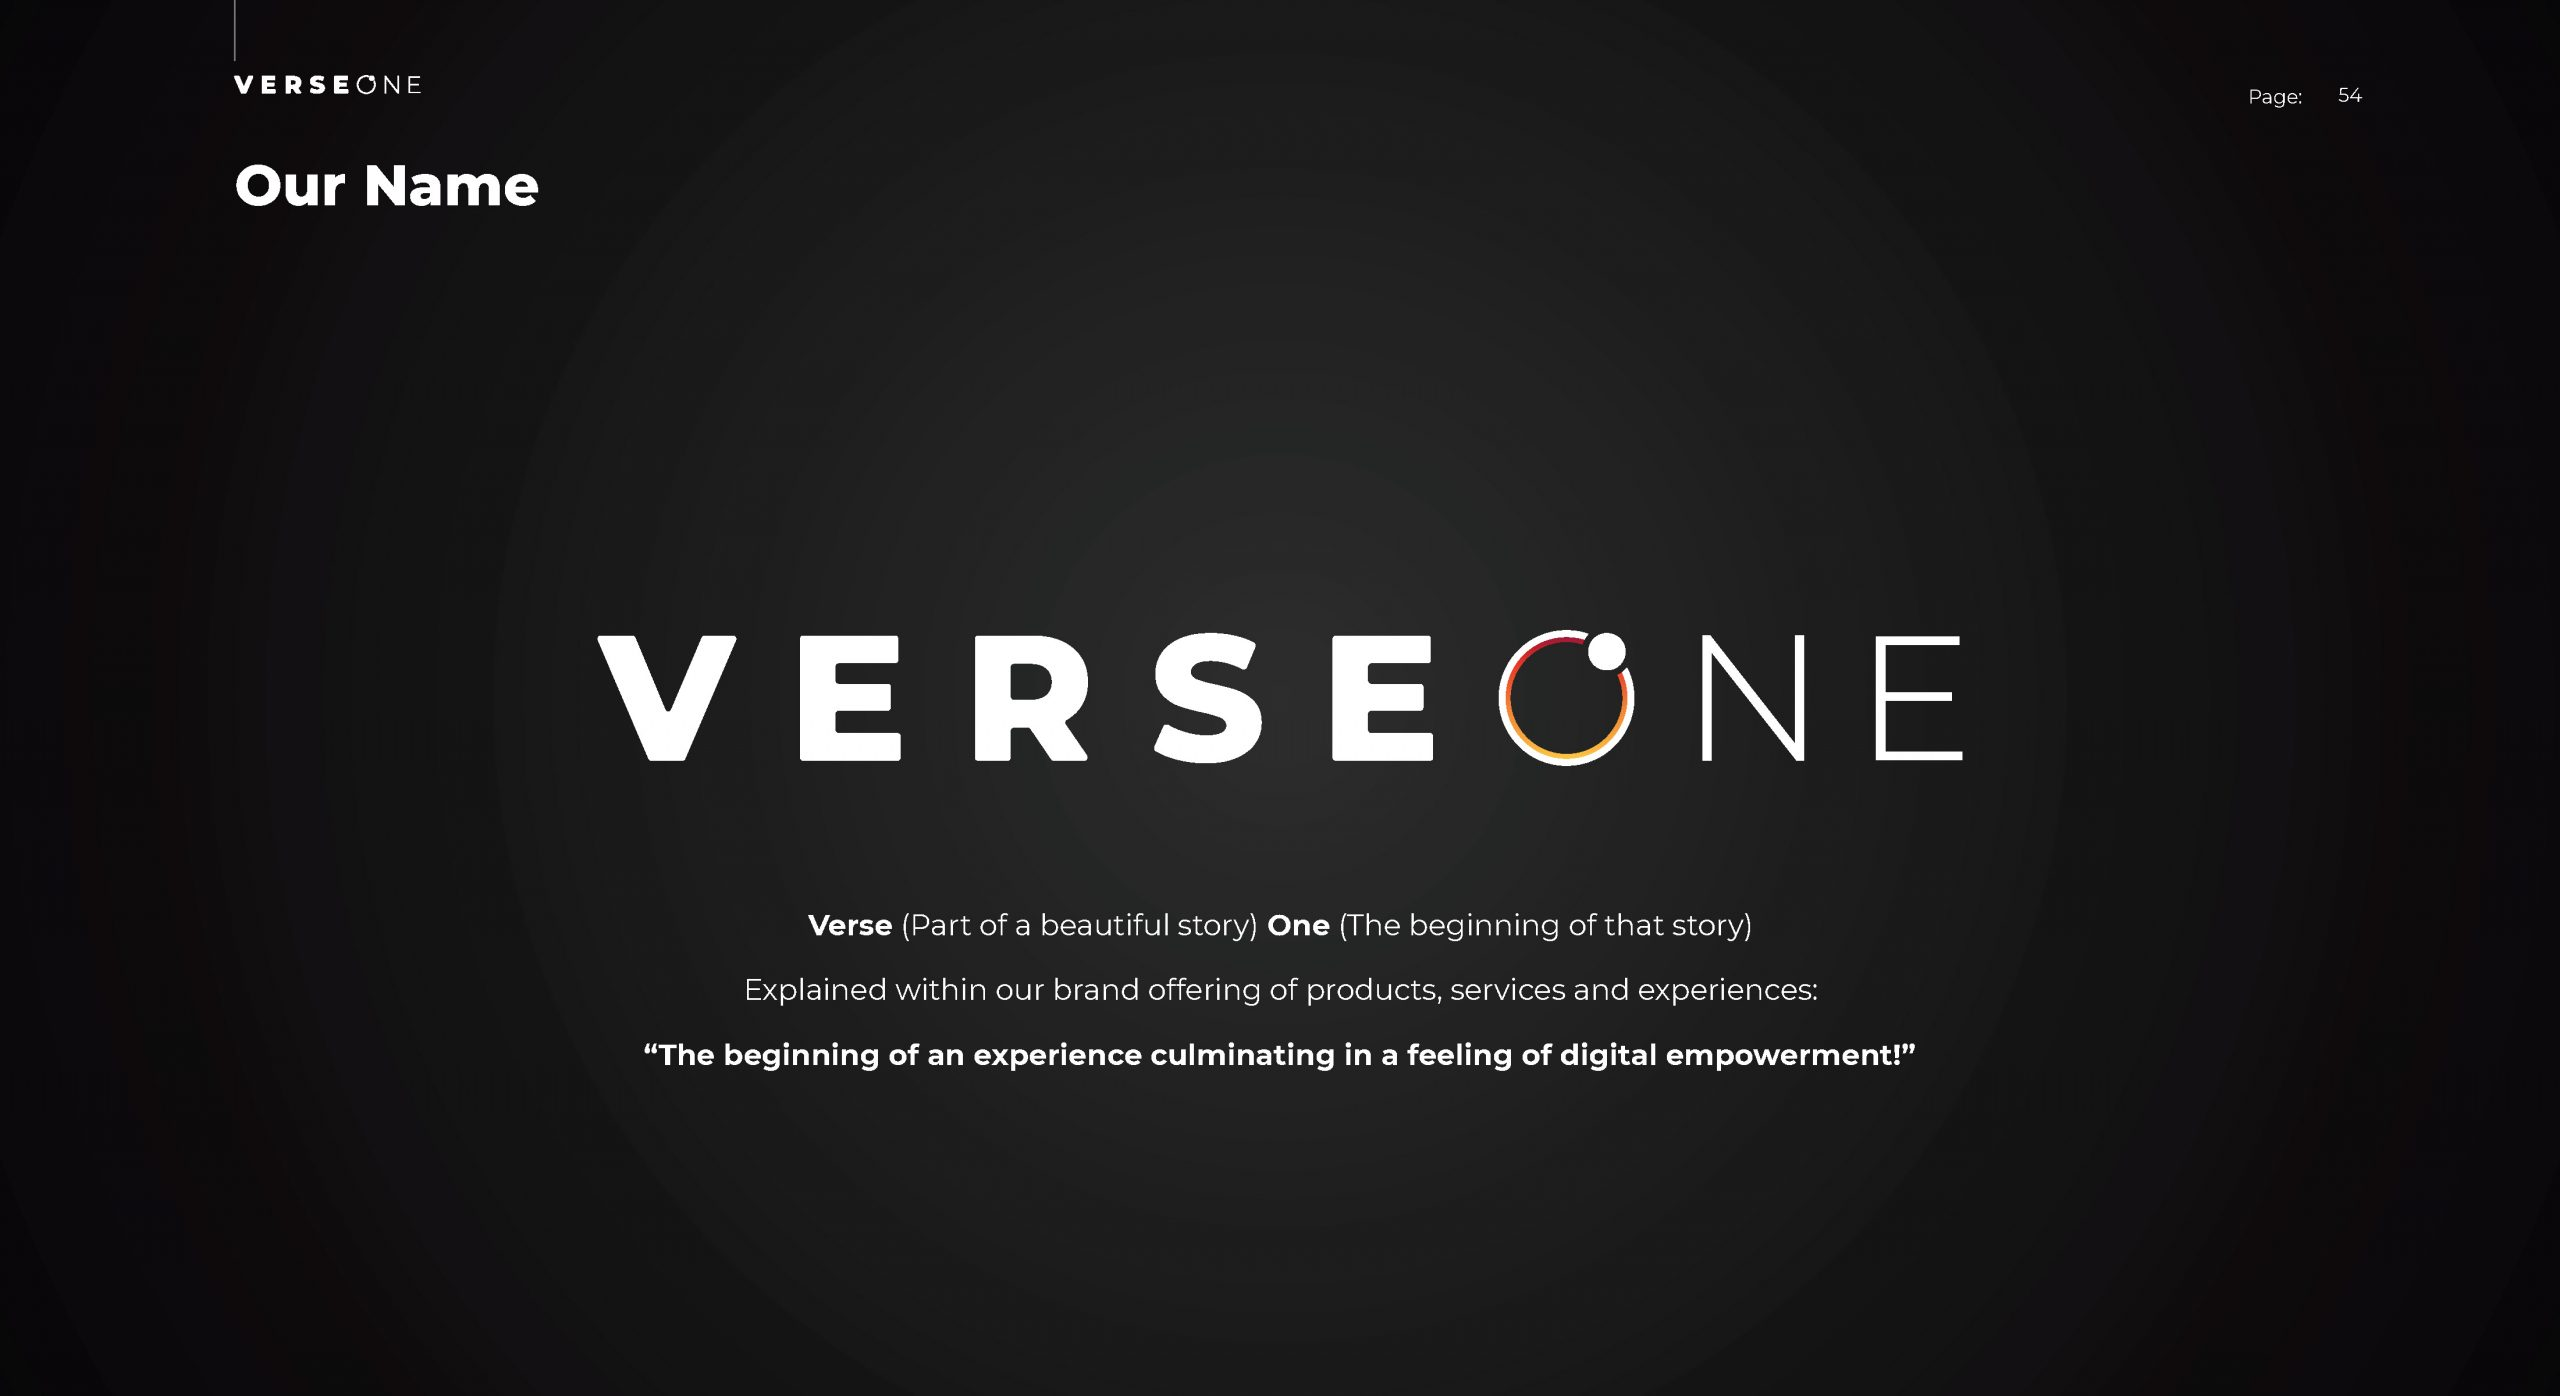 VerseOne_BrandBook_VerseOne.BrandBook.V3small_Page_054